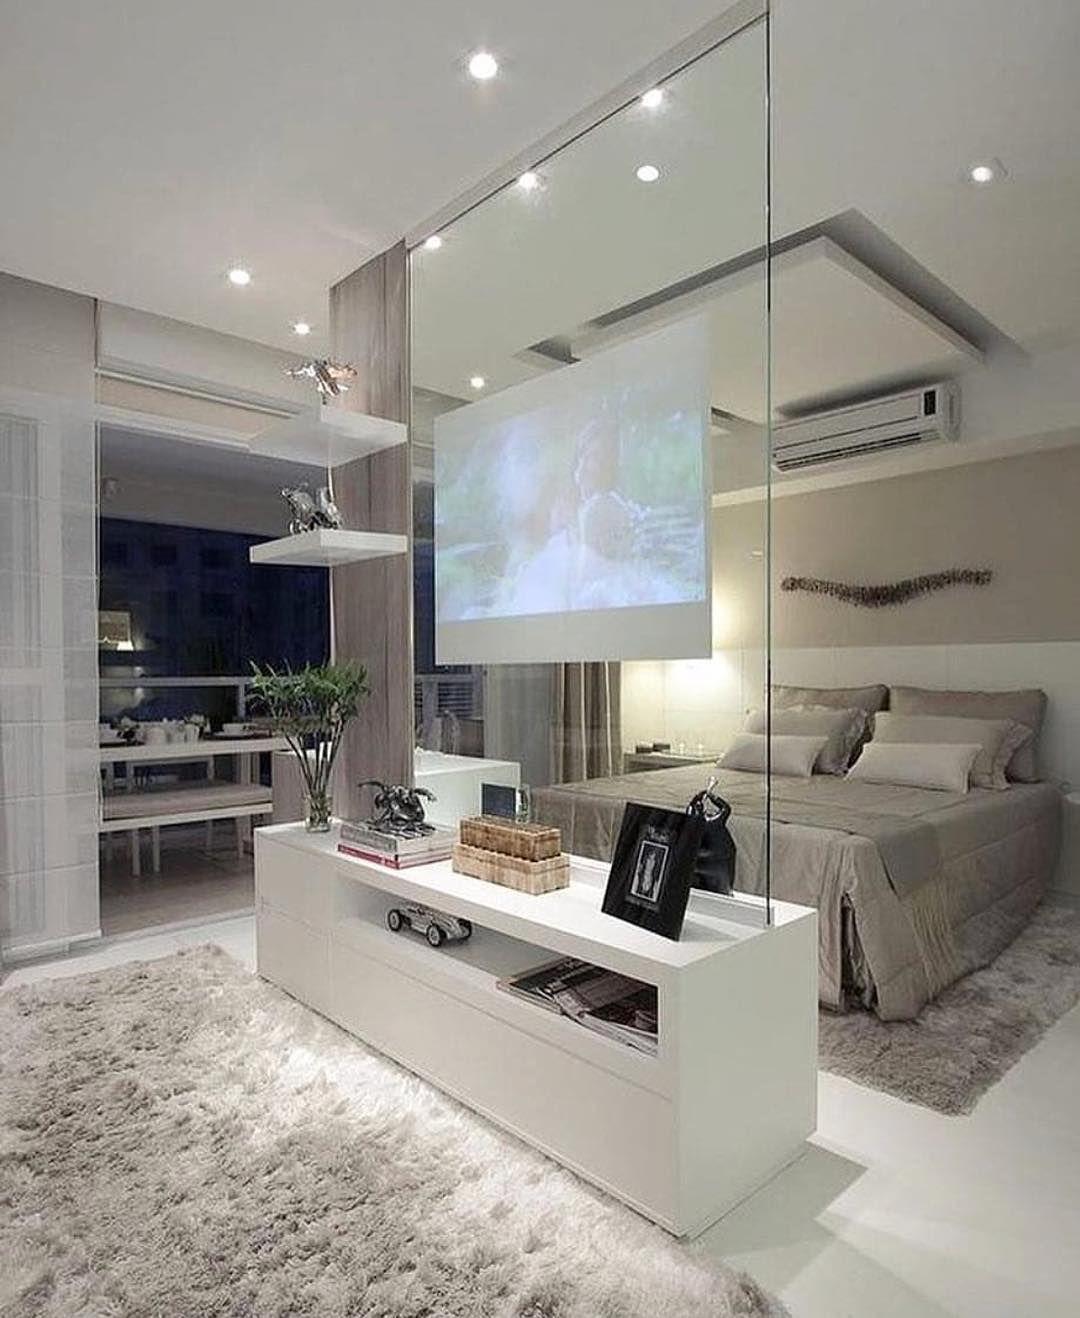 Best Home Decor Thrift Stores Near Me Luxurious Bedrooms Interior Design School Home Decor Online